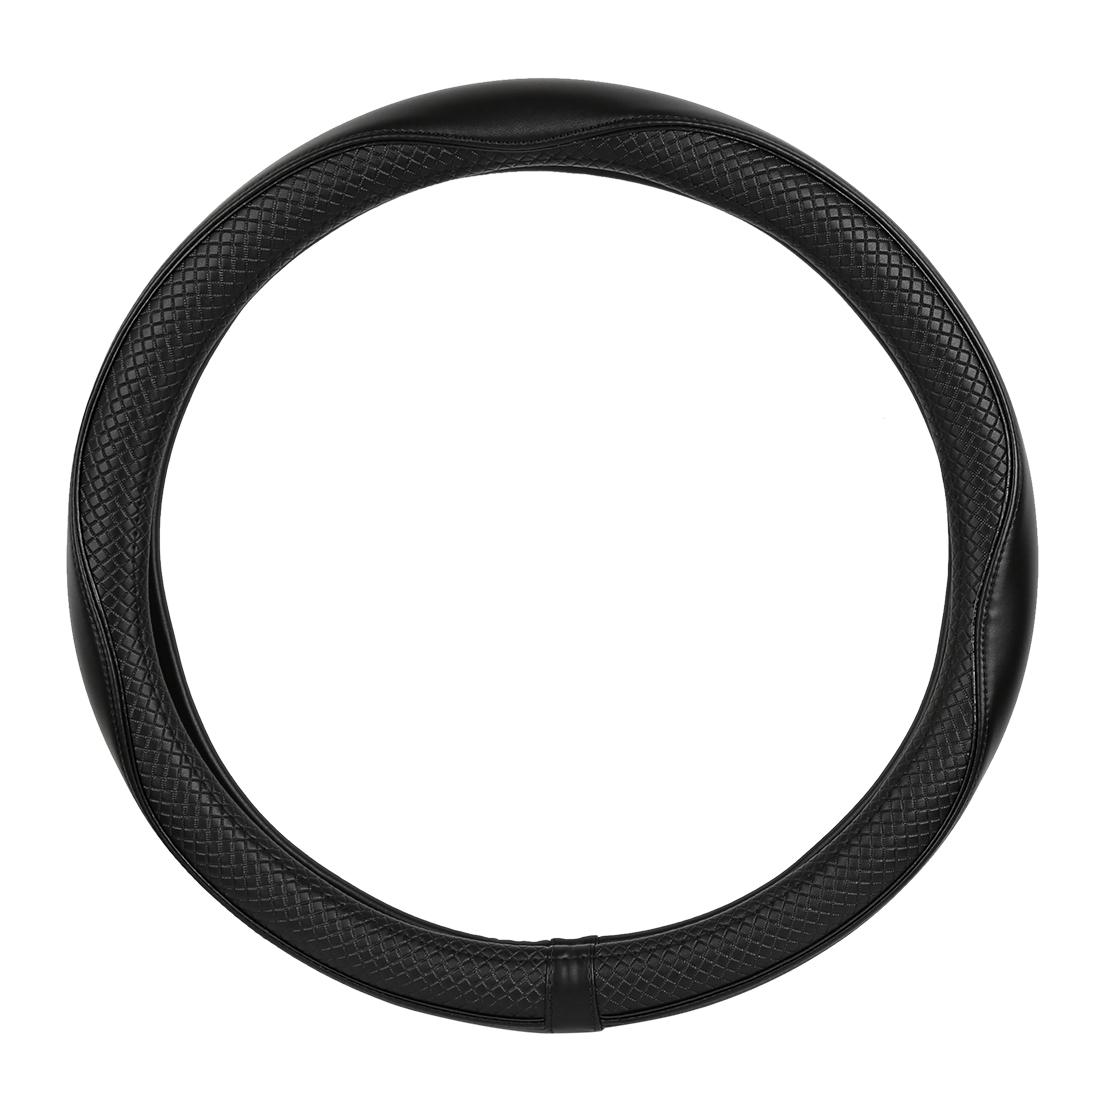 "38cm 15"" Leather Car Auto Steering Wheel Cover Anti-Slip Protector Black"